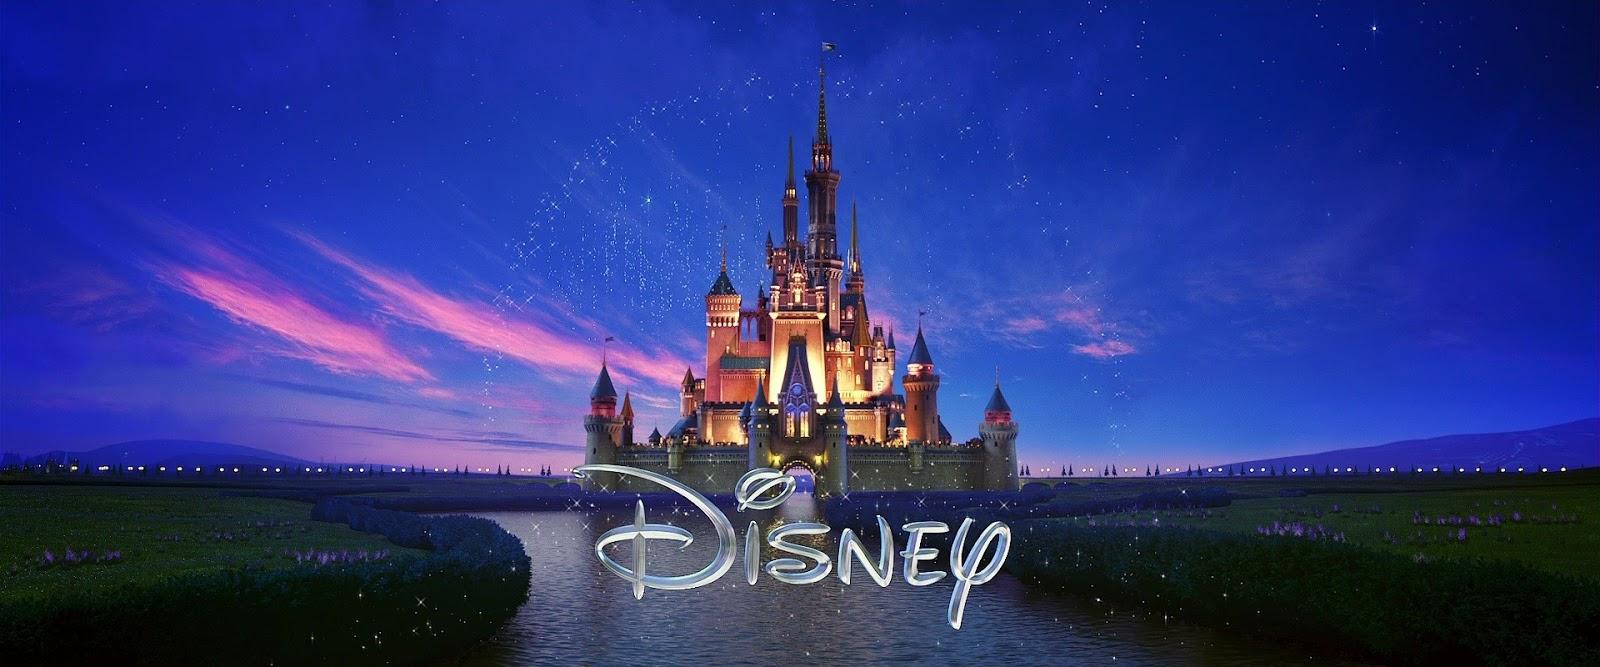 The Evolution of the Disney LogoDisney Pixar Logo Castle